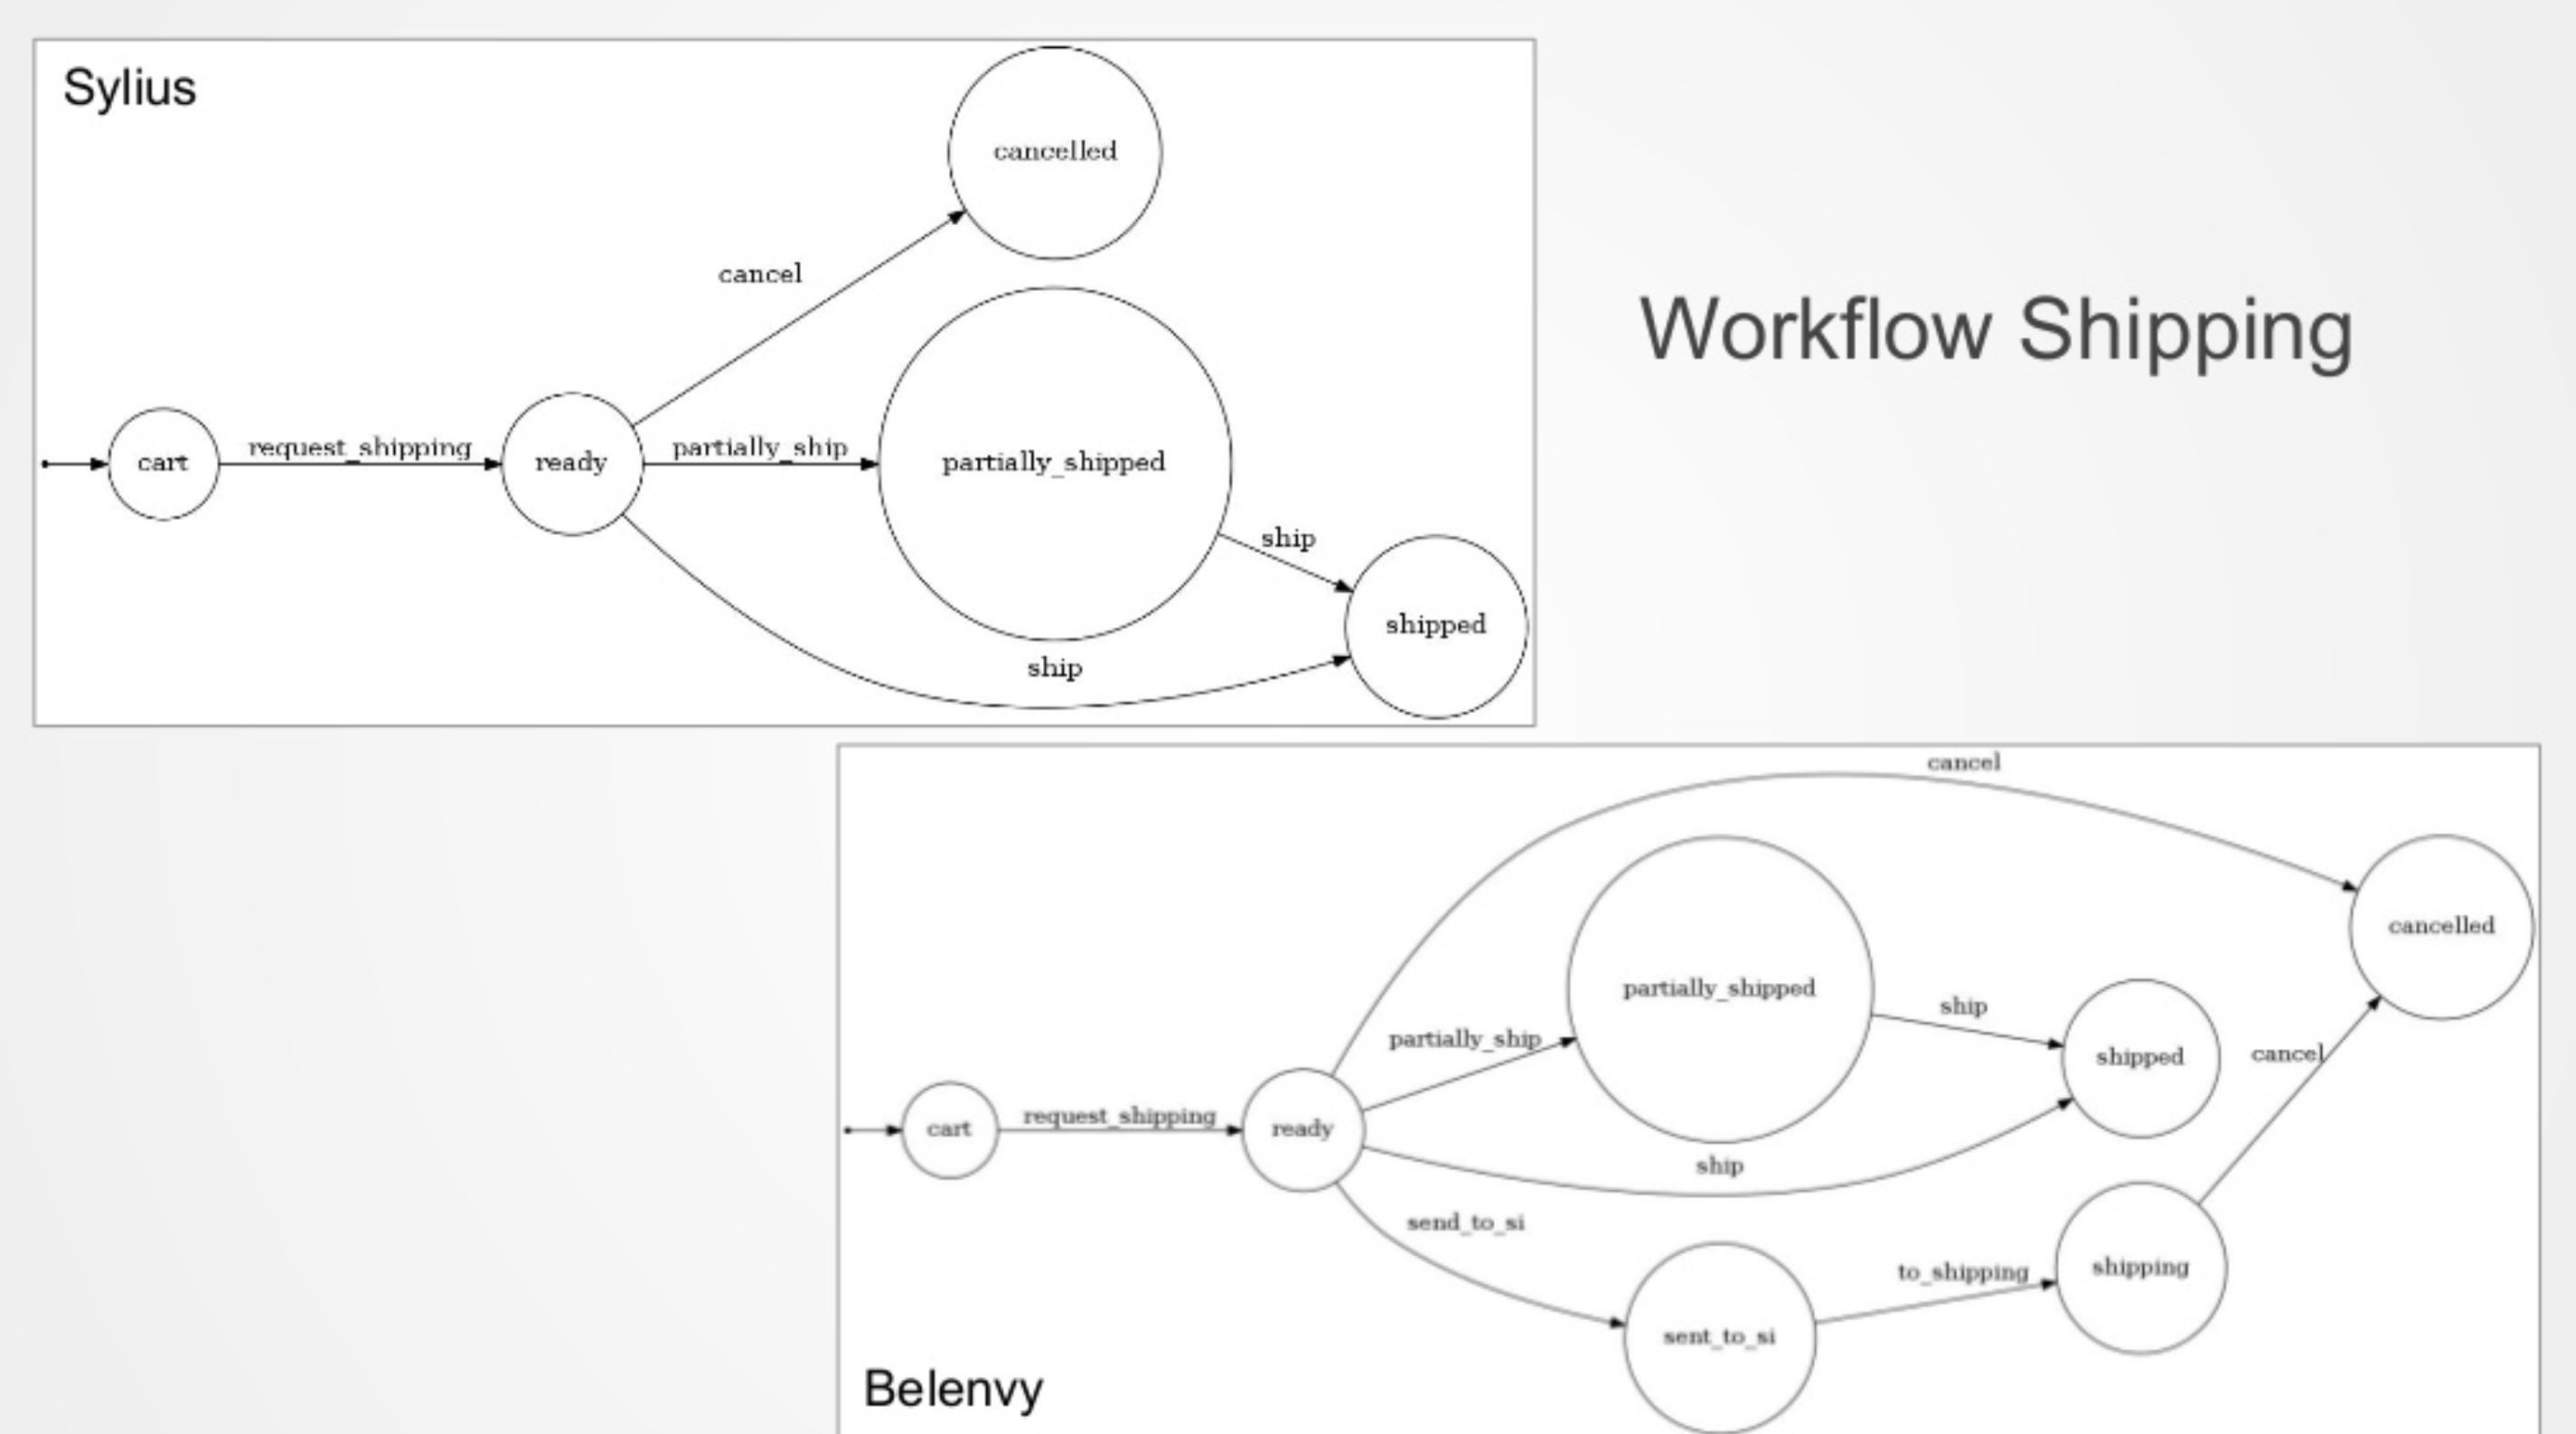 Workflow shipping de Sylius